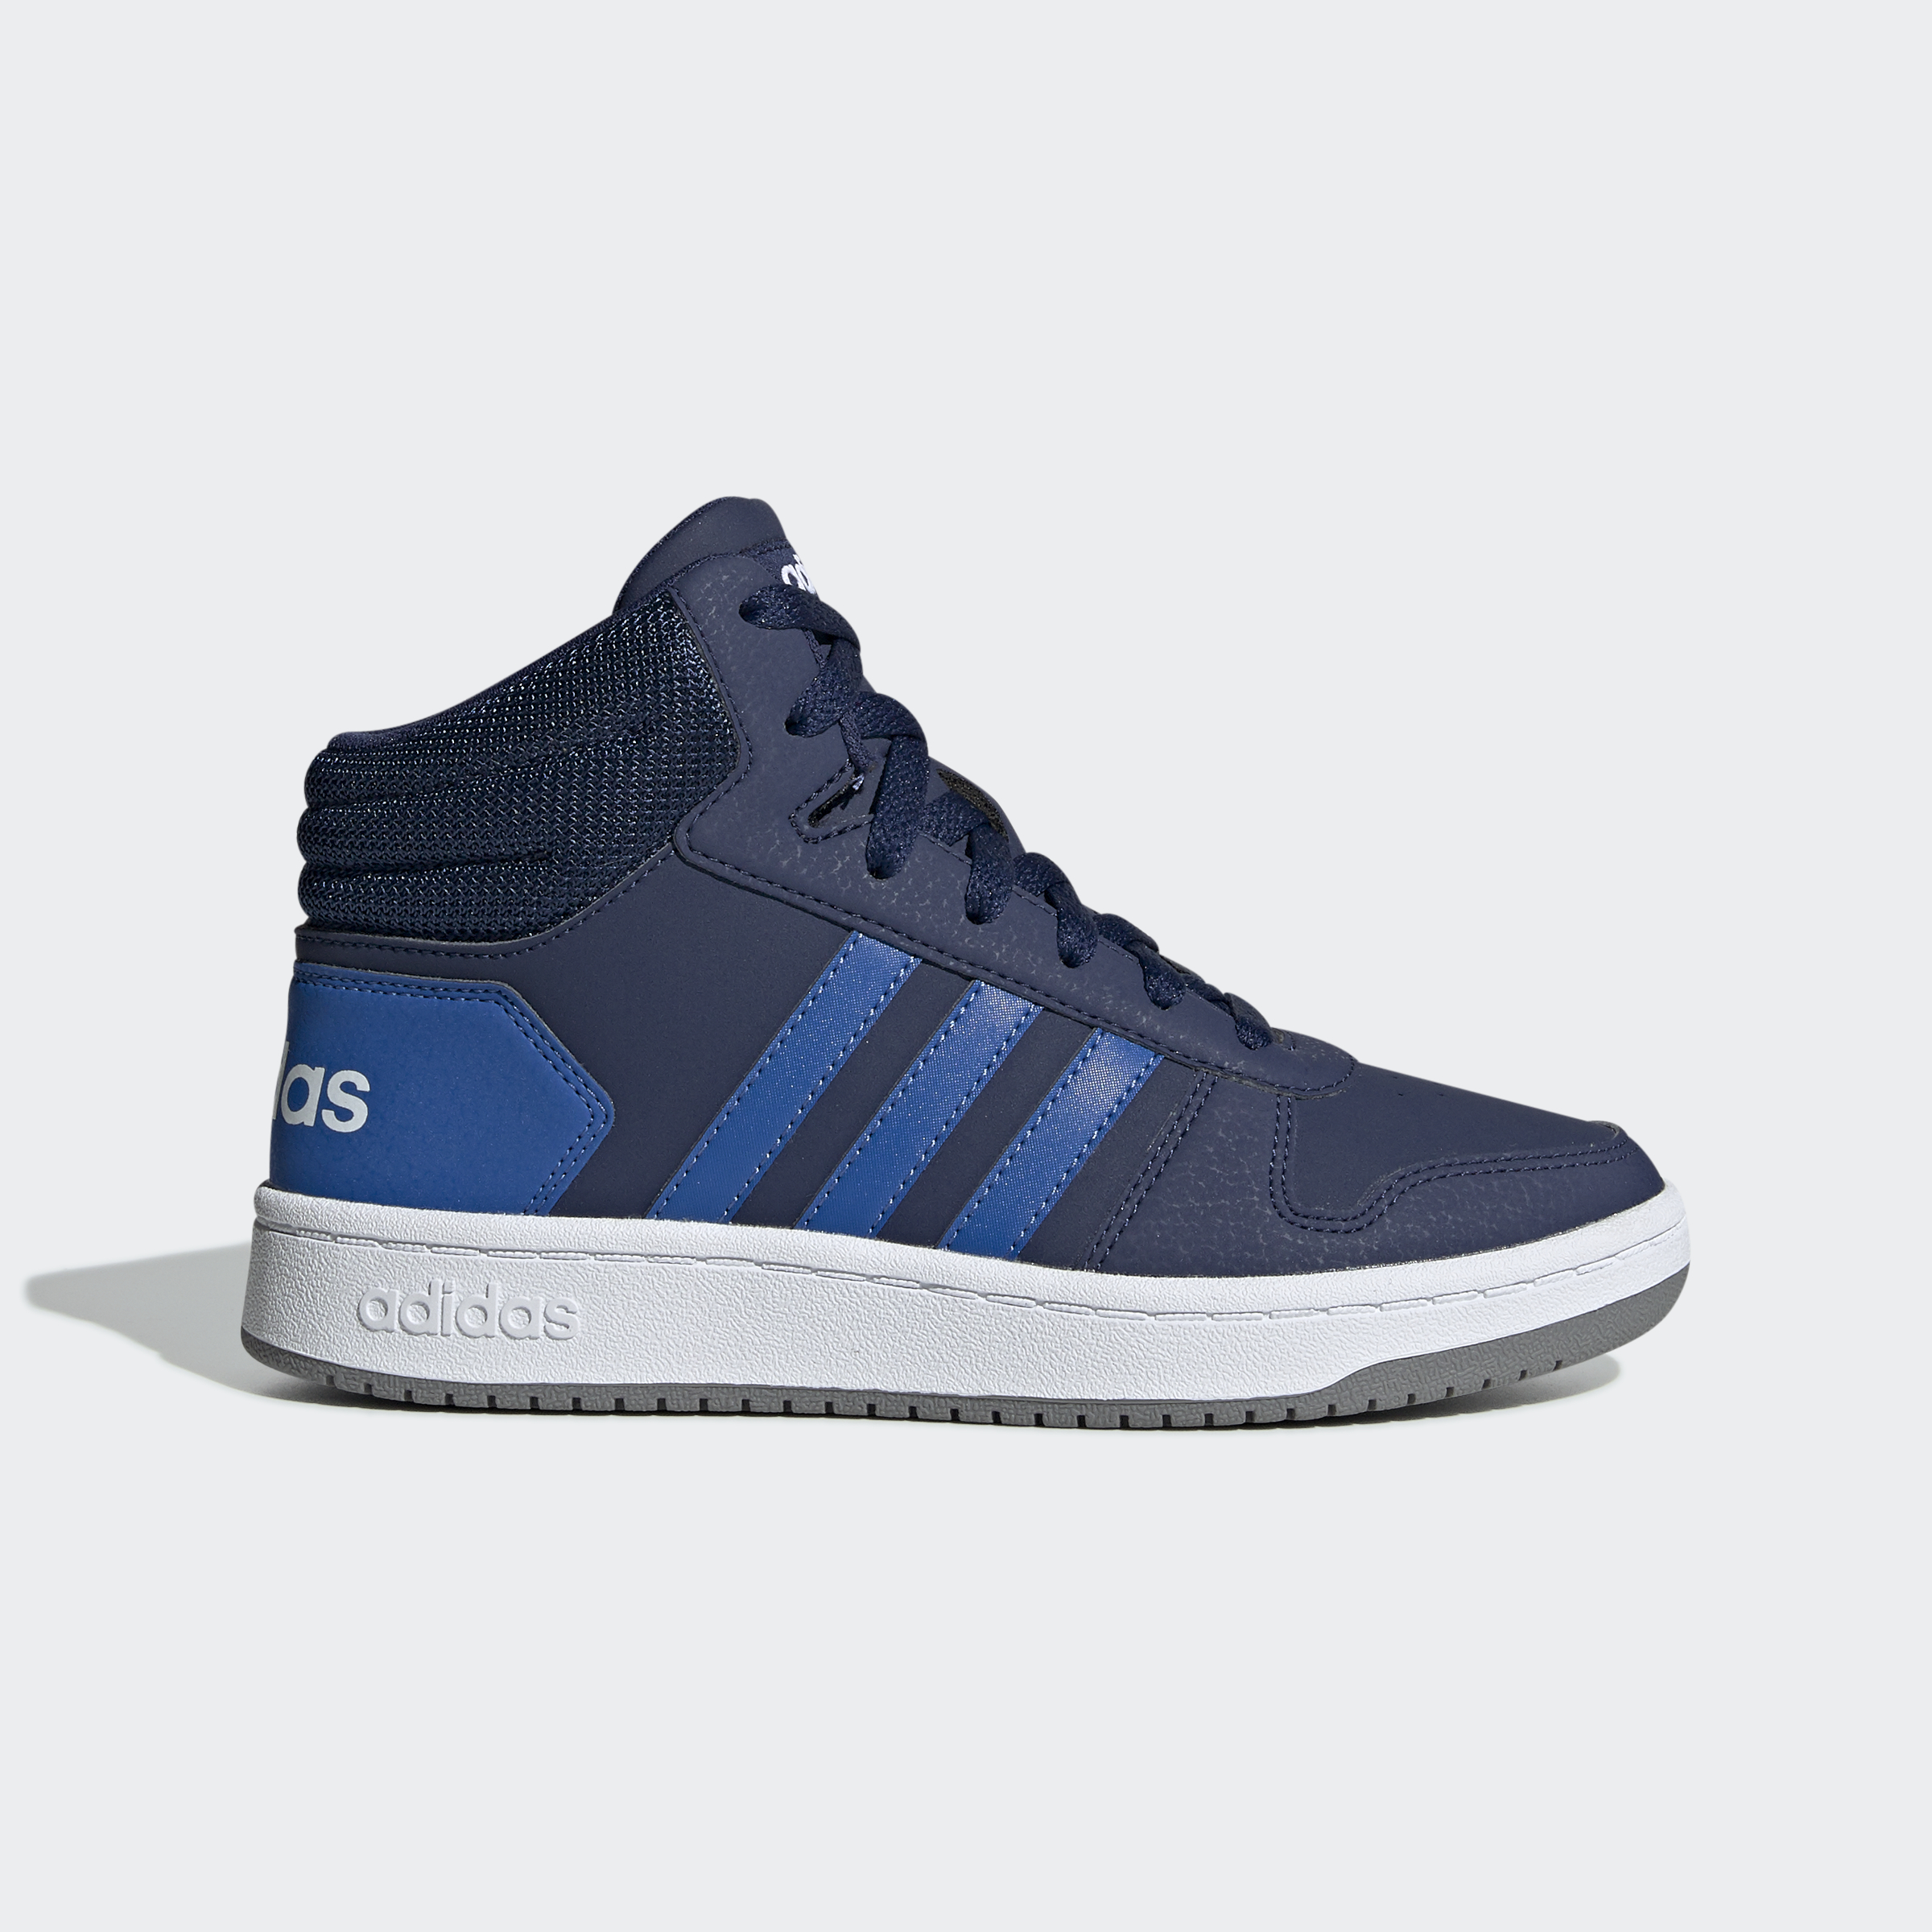 adidas-Hoops-2-0-Mid-Shoes-Kids-039-High-Tops thumbnail 16